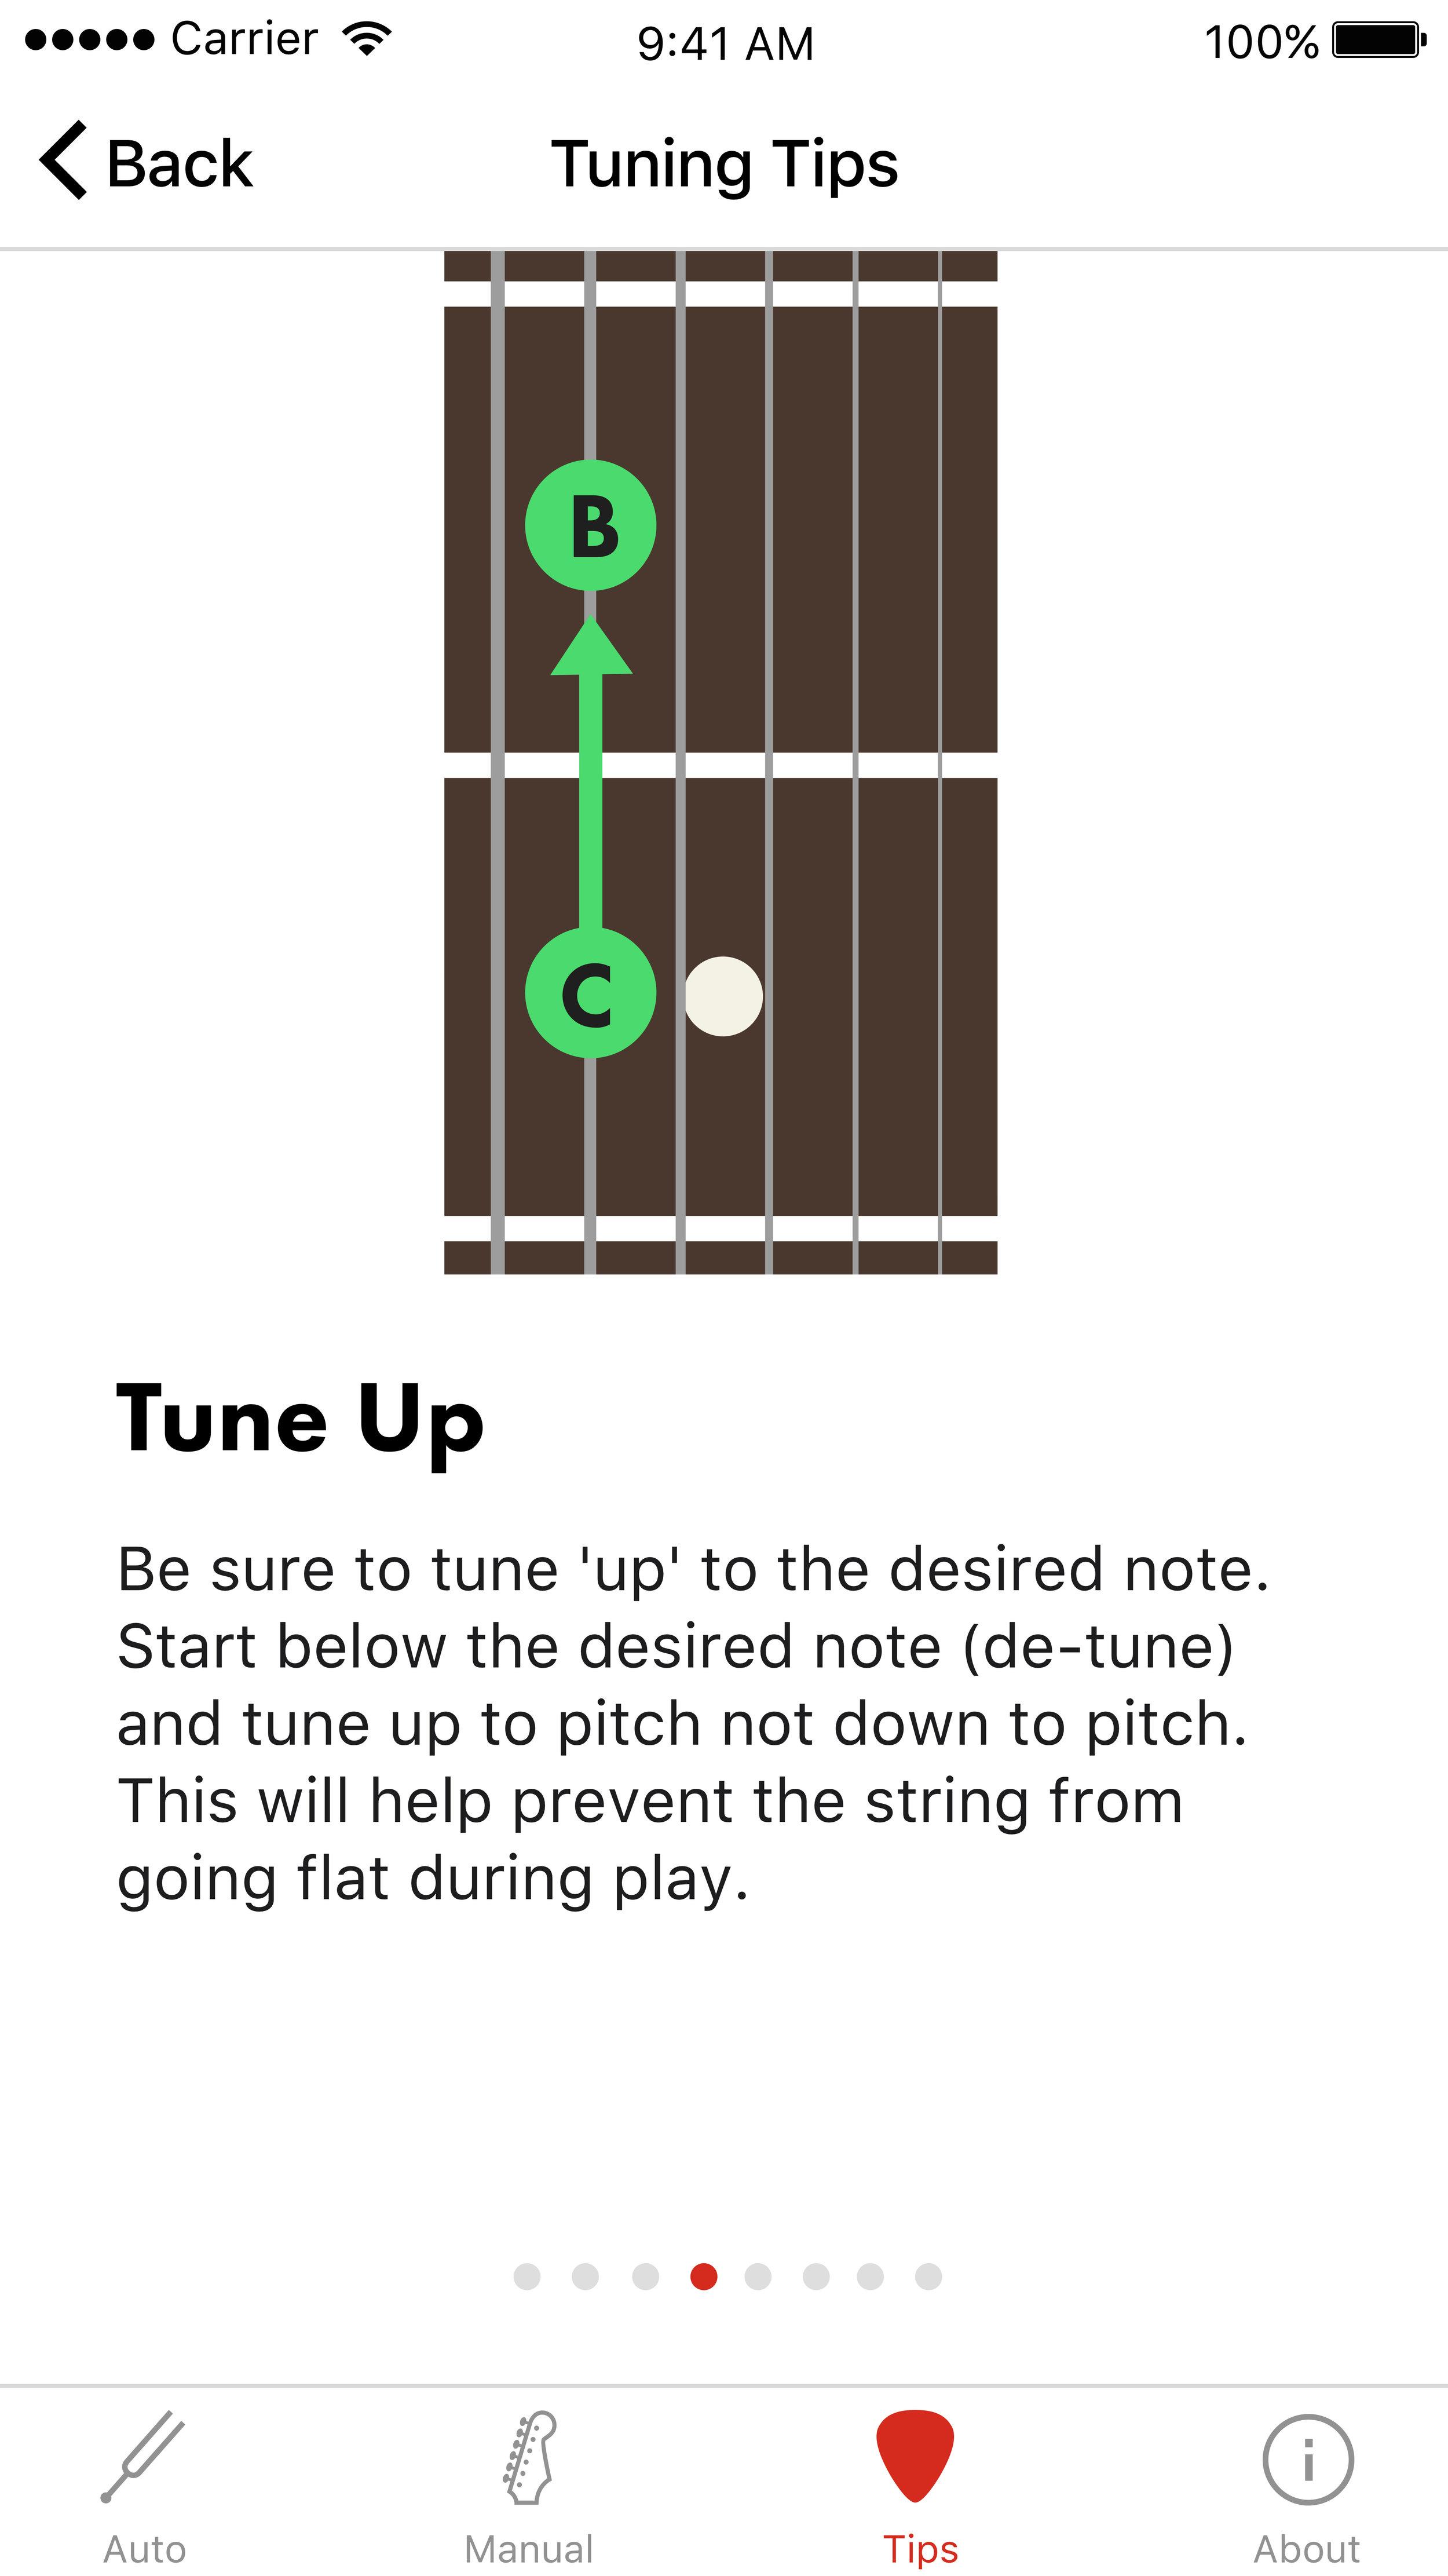 tuning-tips-tune-up.jpg